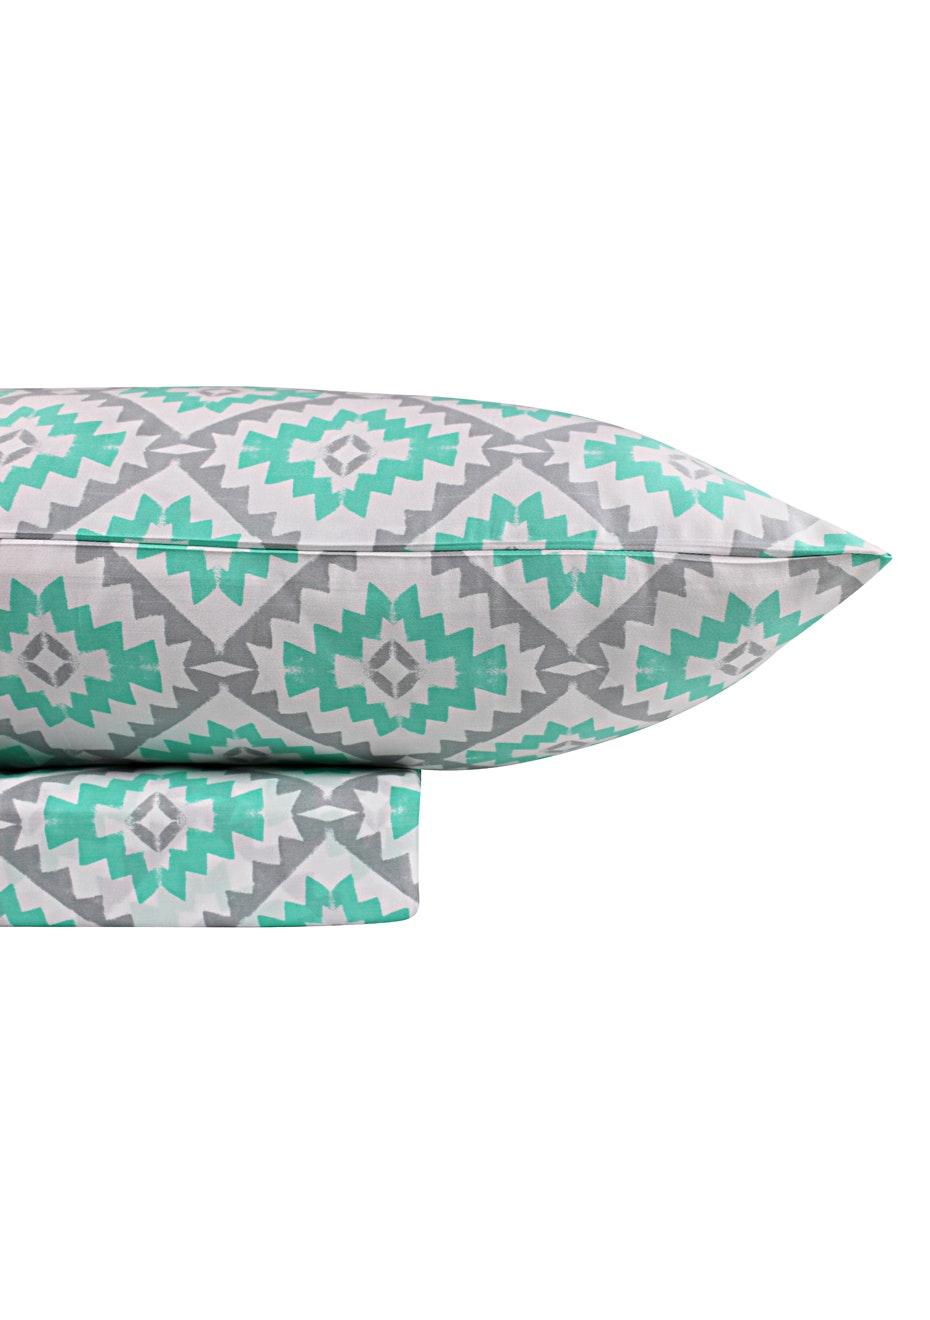 1000 Thread Count –Yukata Print Sheet Sets -Mint | Silver - King Bed